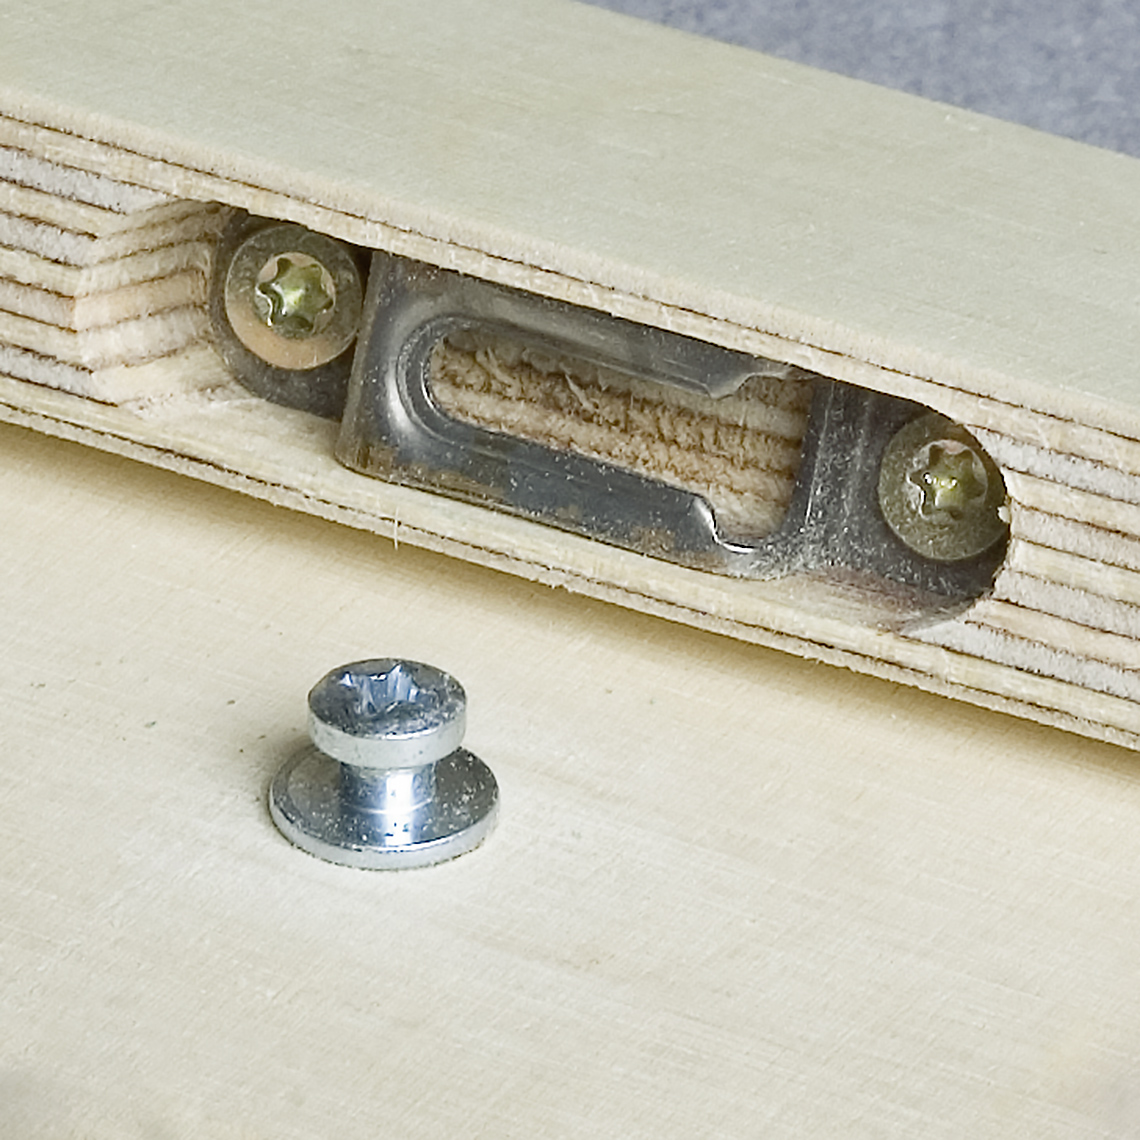 Mod-eez Furniture fasteners